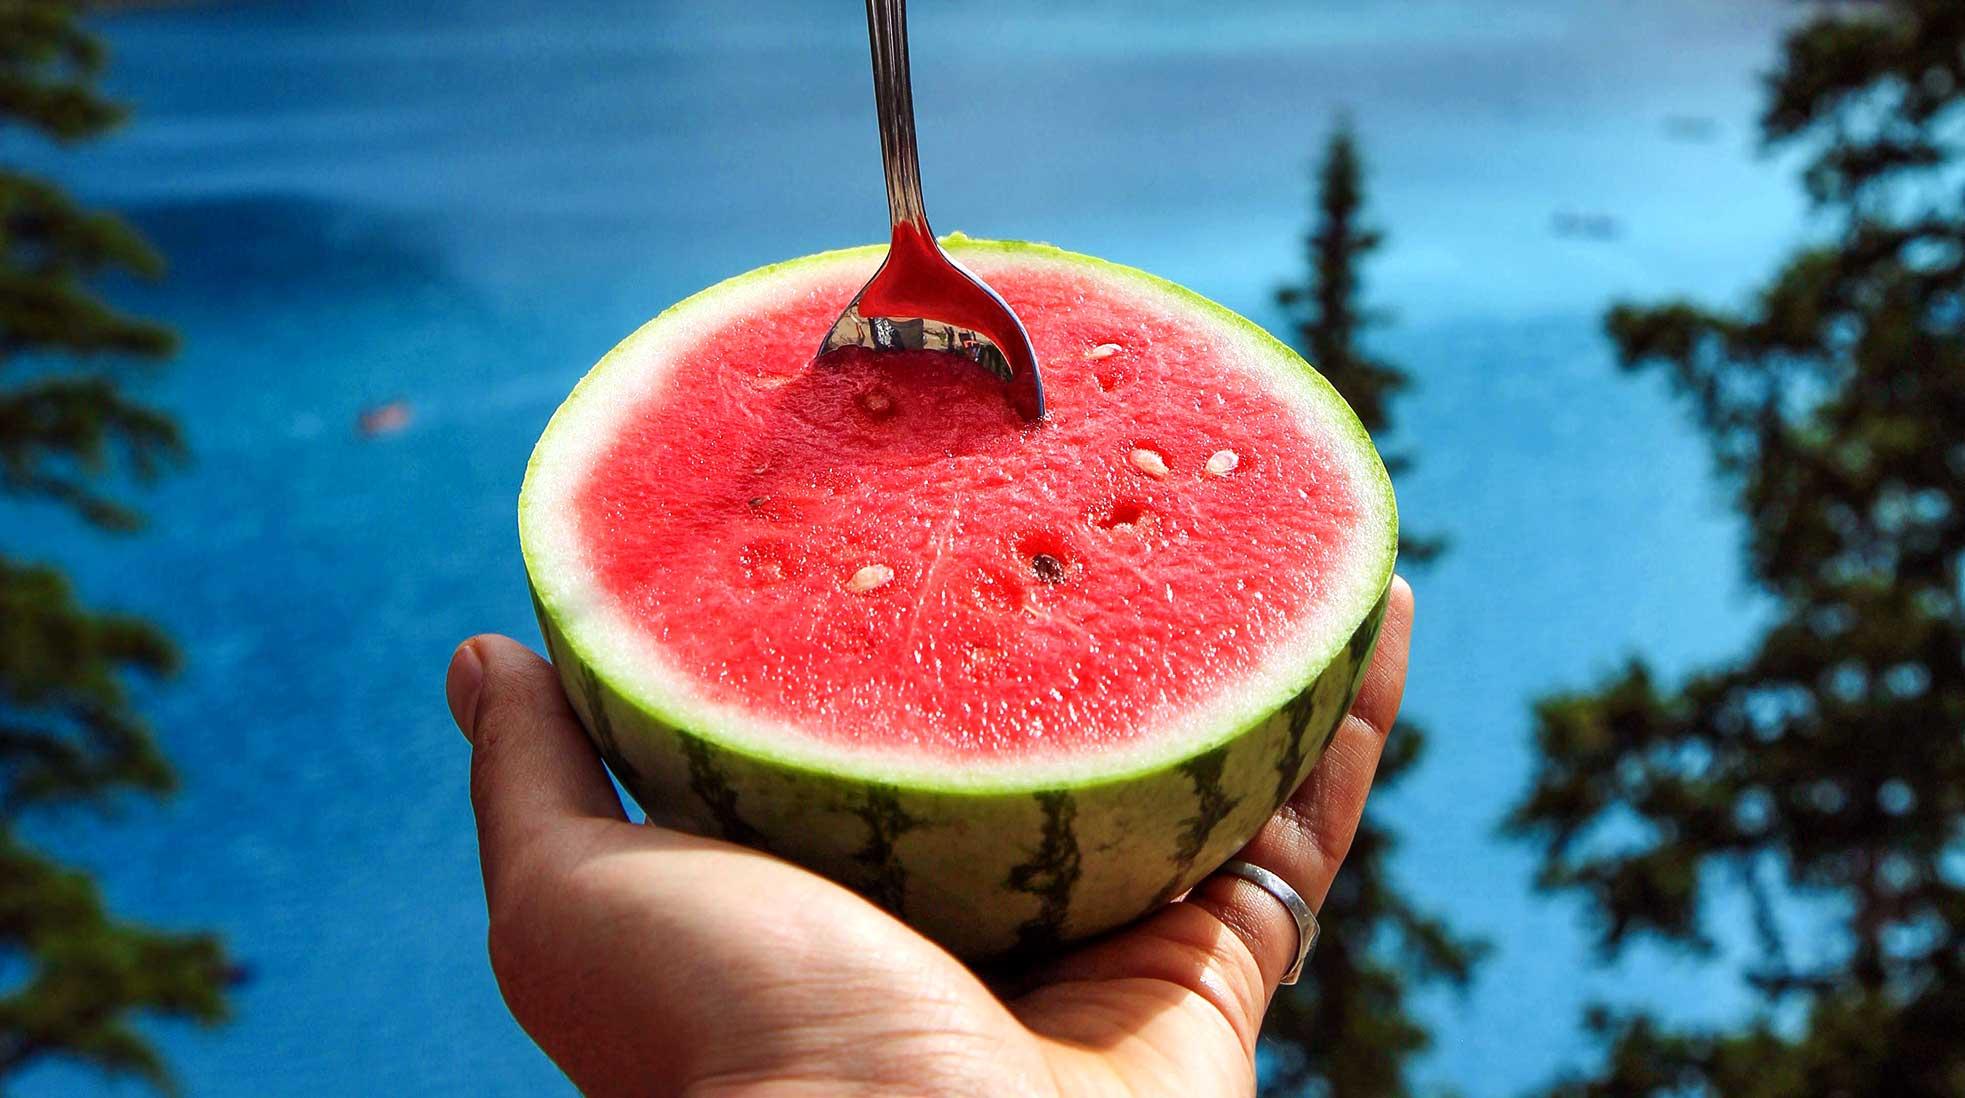 A halved watermelon